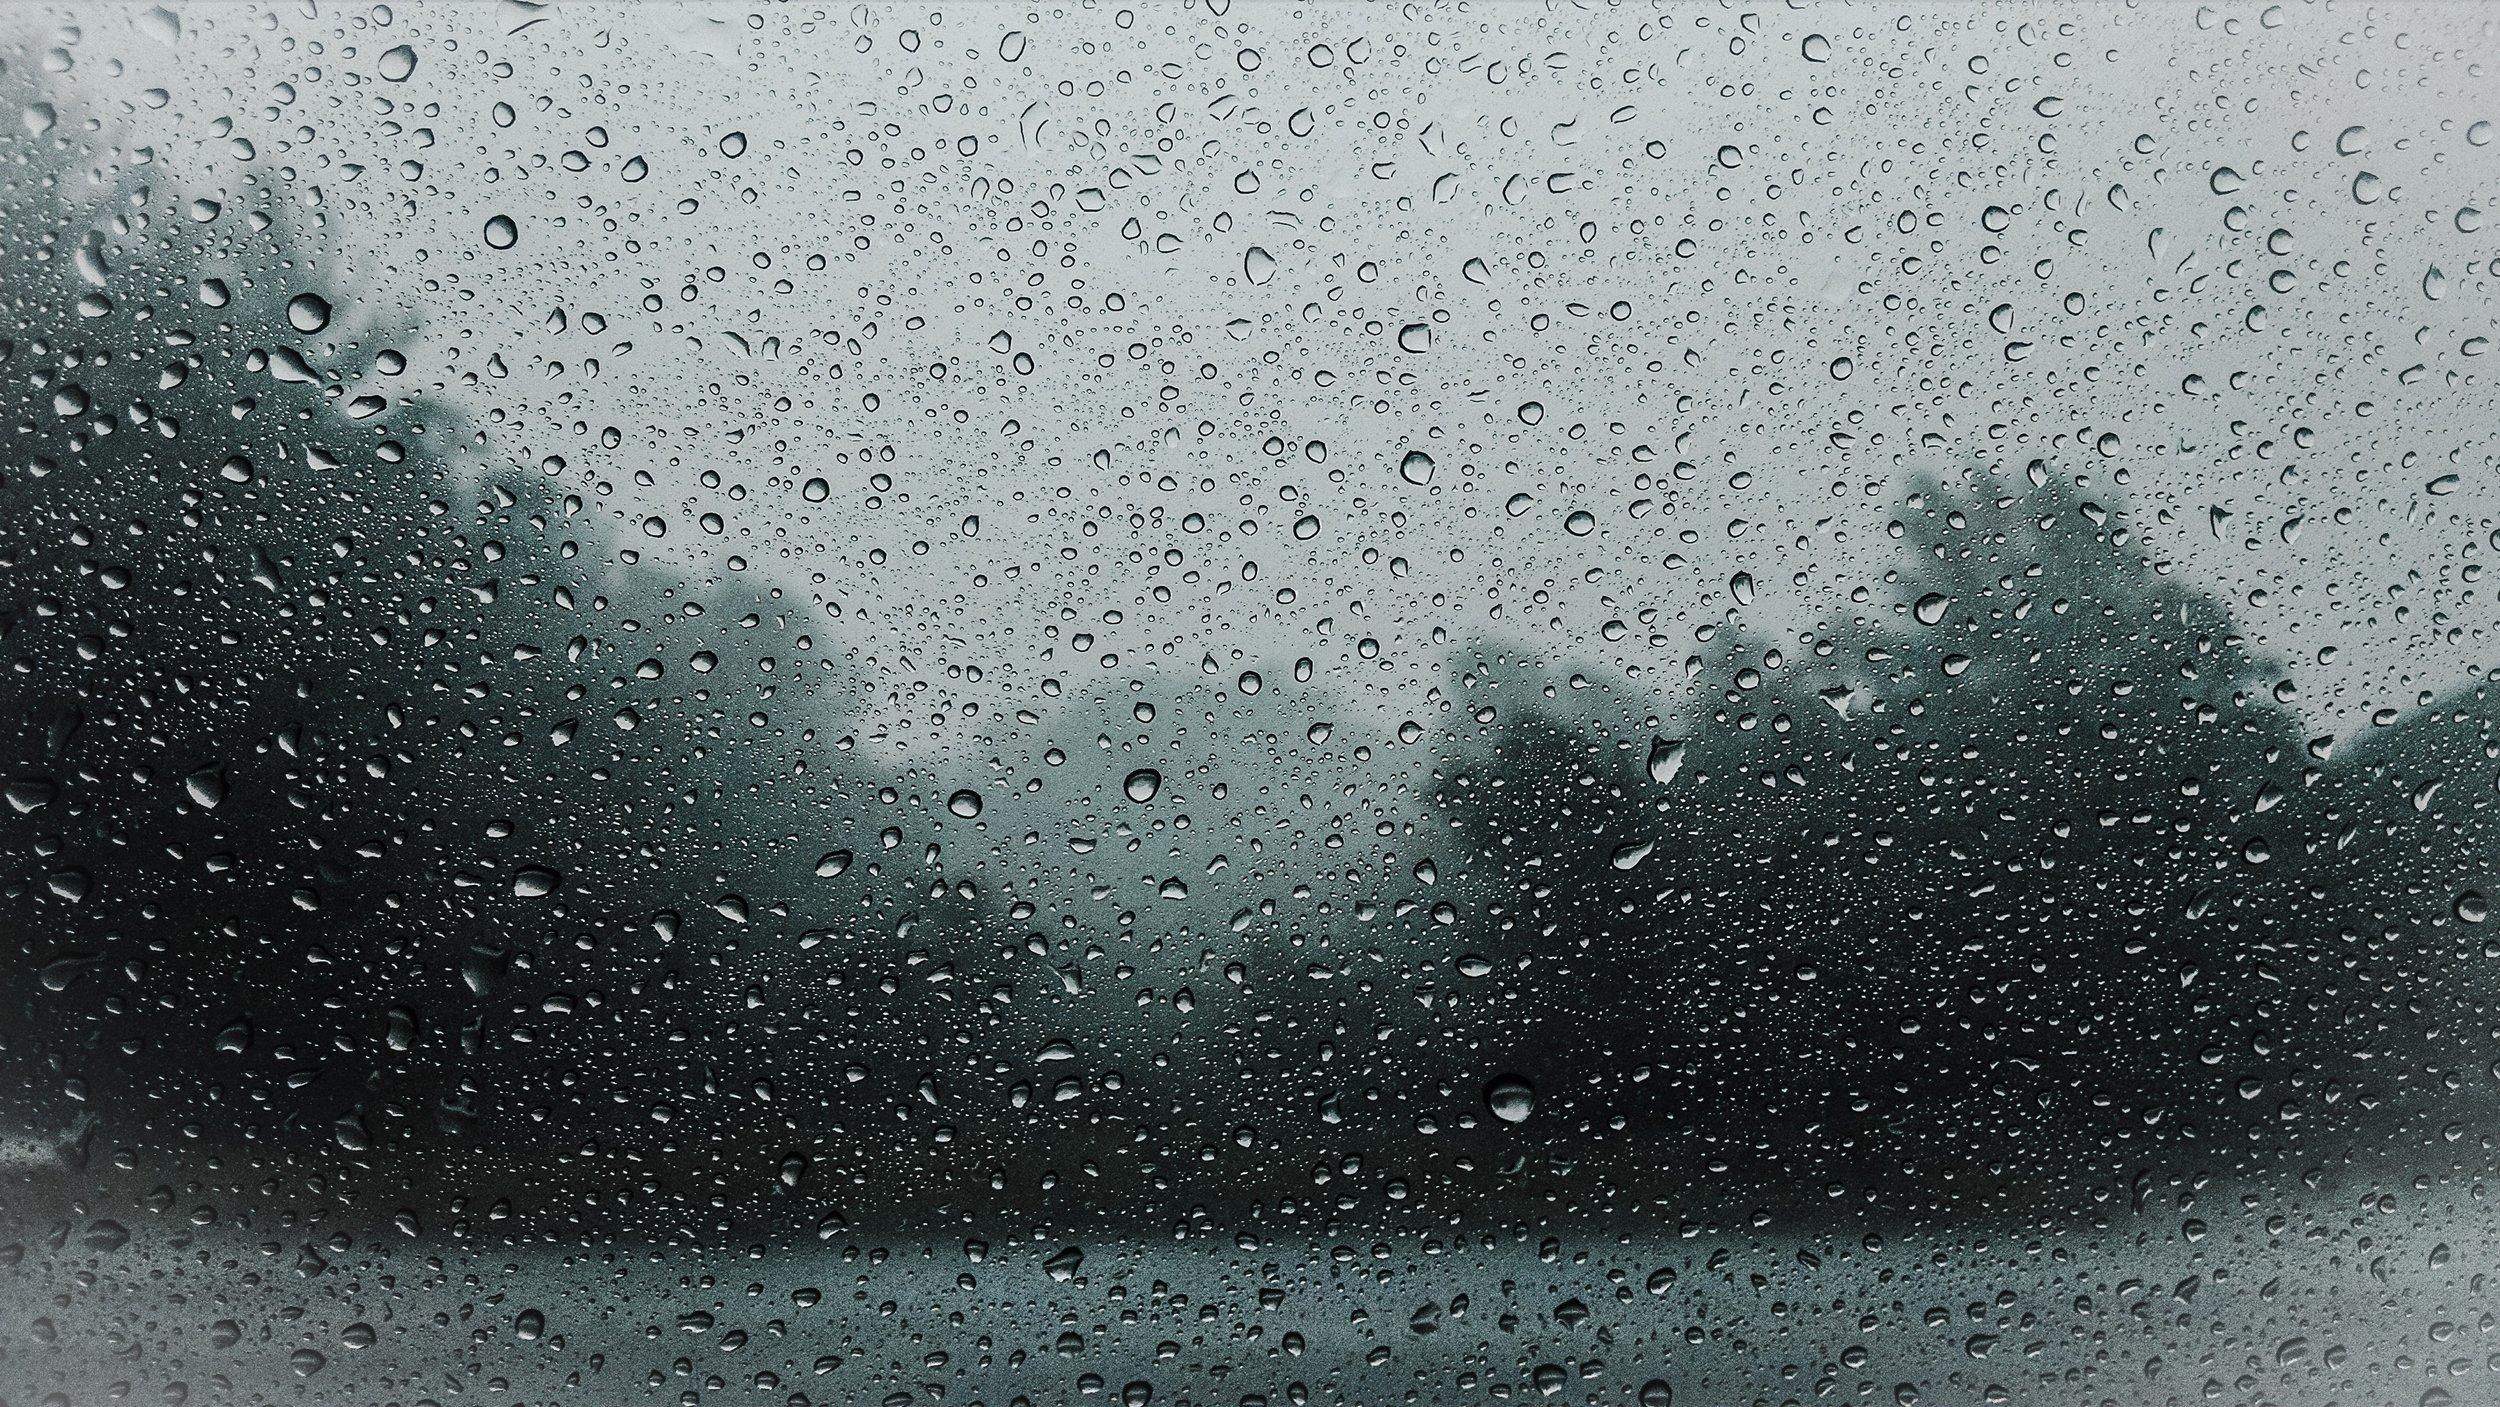 raindrops-828954.jpg